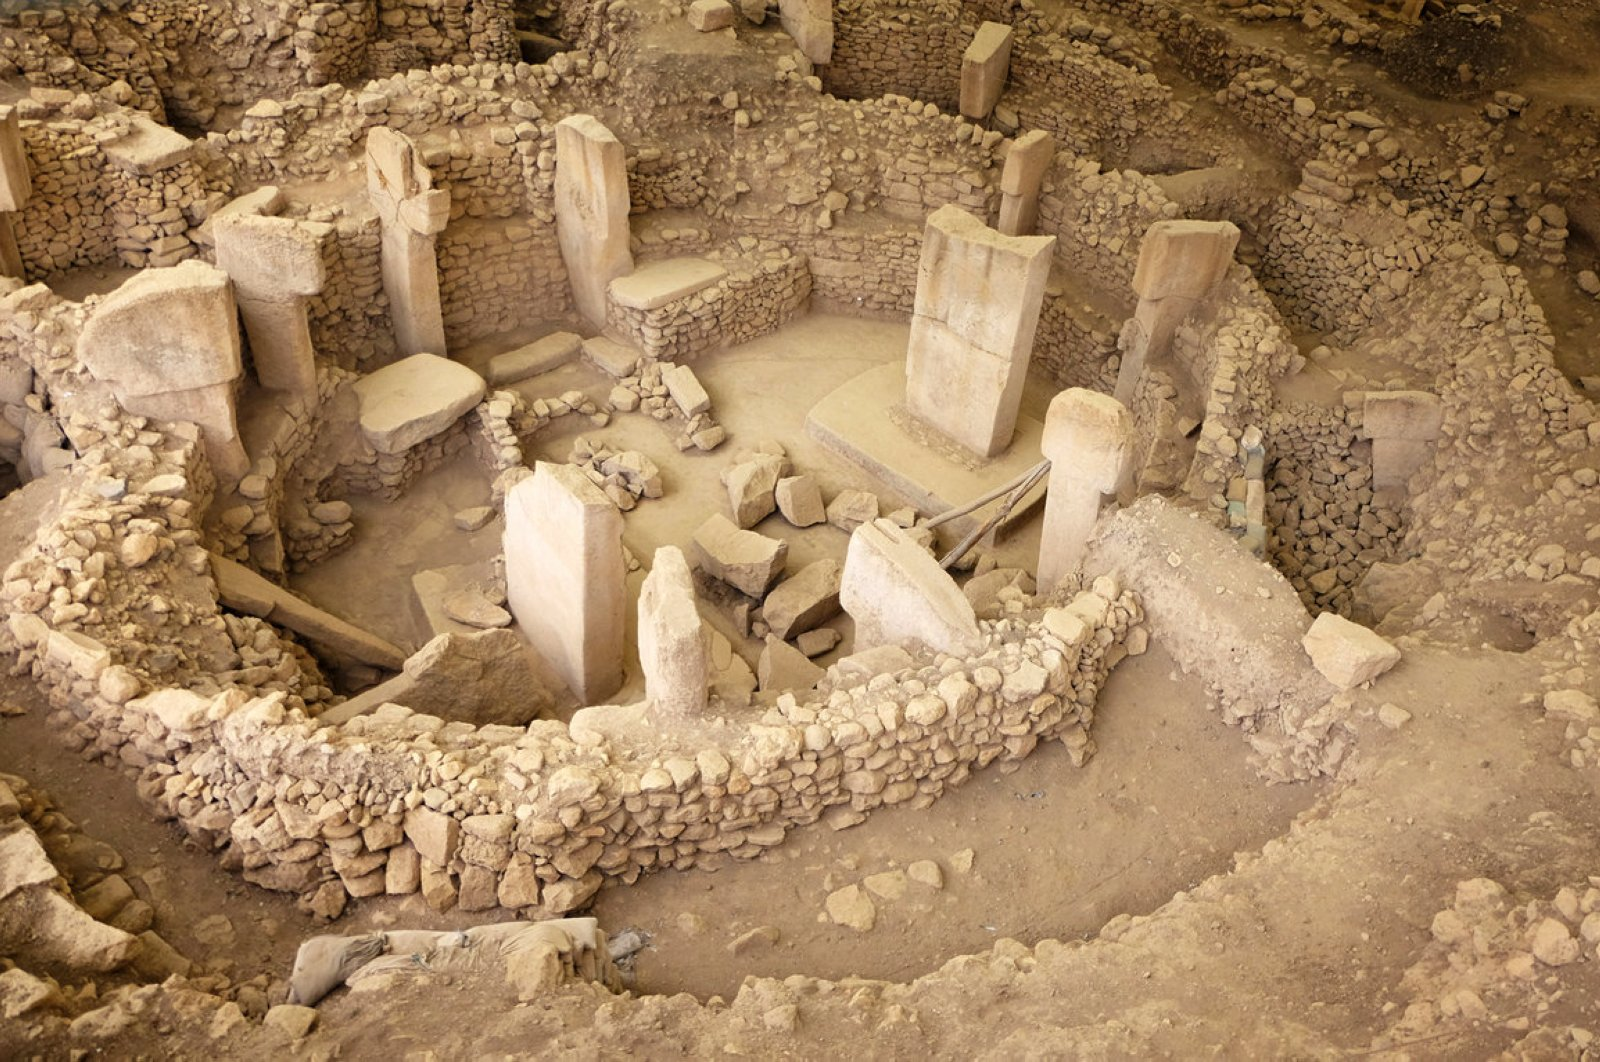 An aerial view of the ancient site of Göbeklitepe, Şanlıurfa province, Turkey. (DHA Photo)